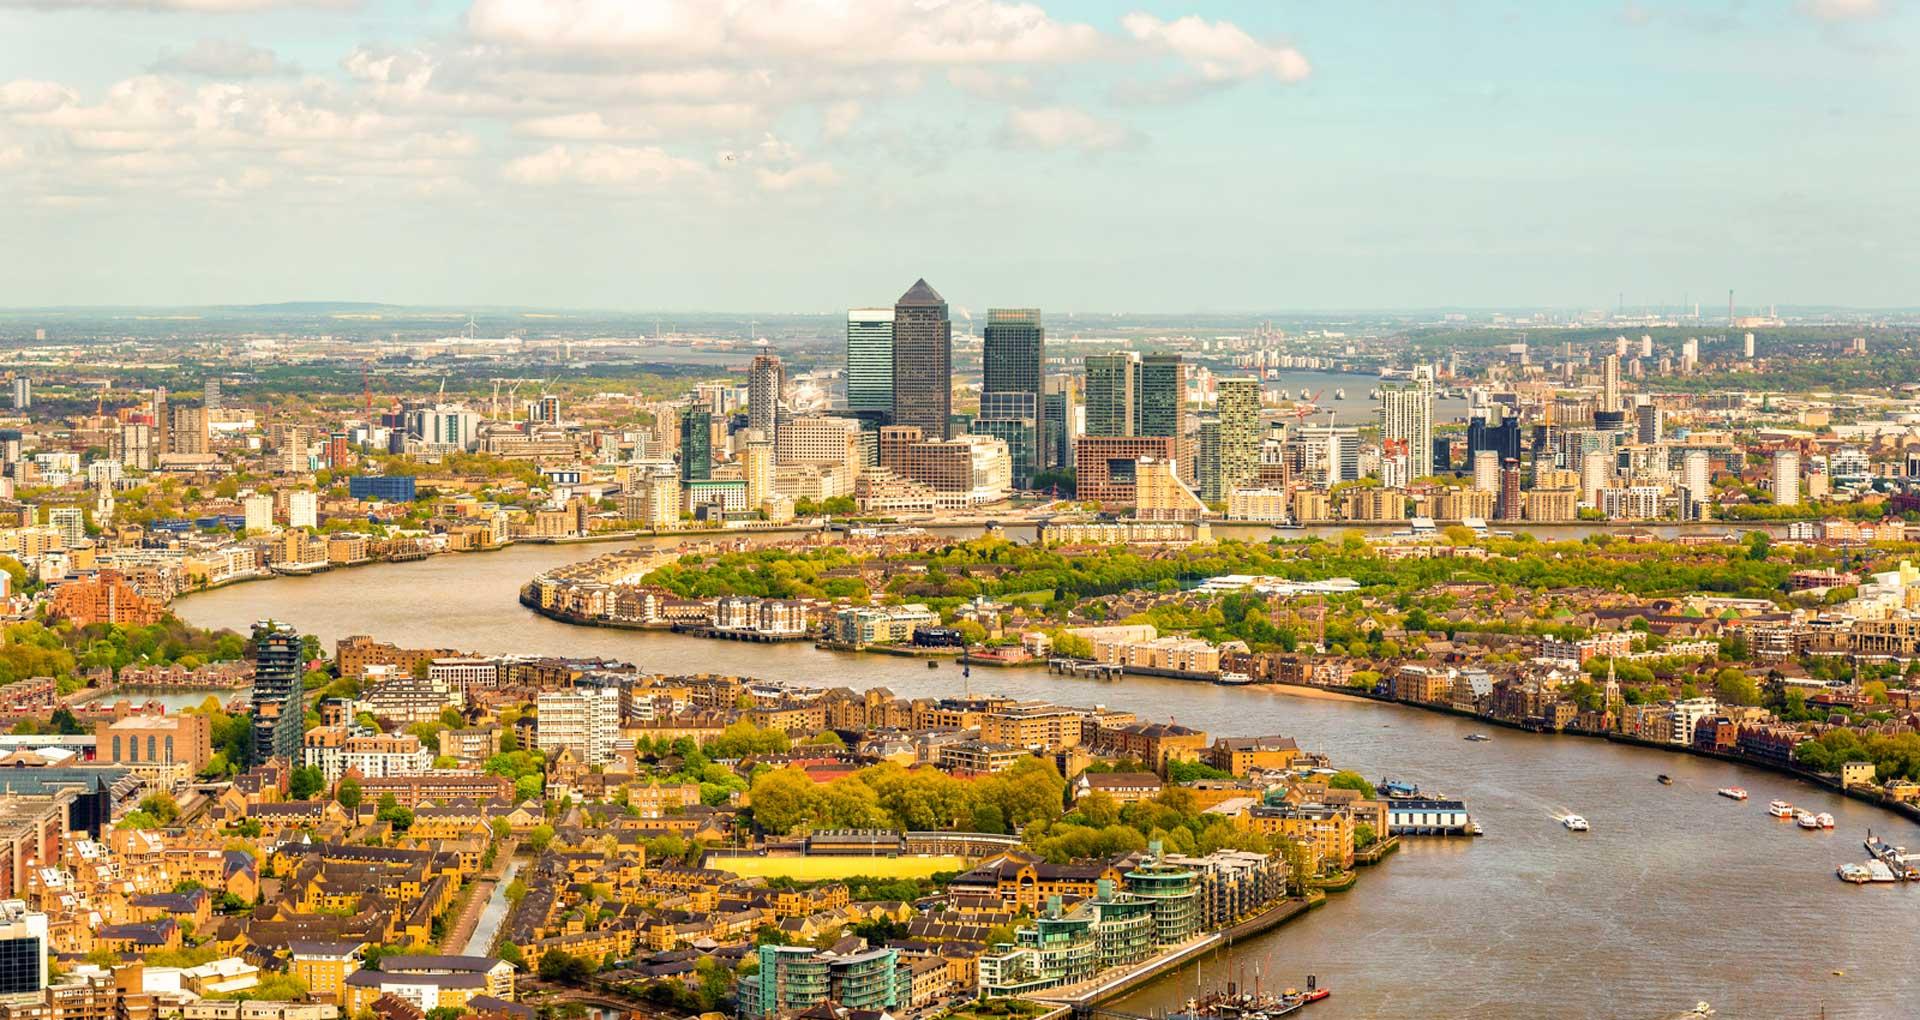 Thames aerial view